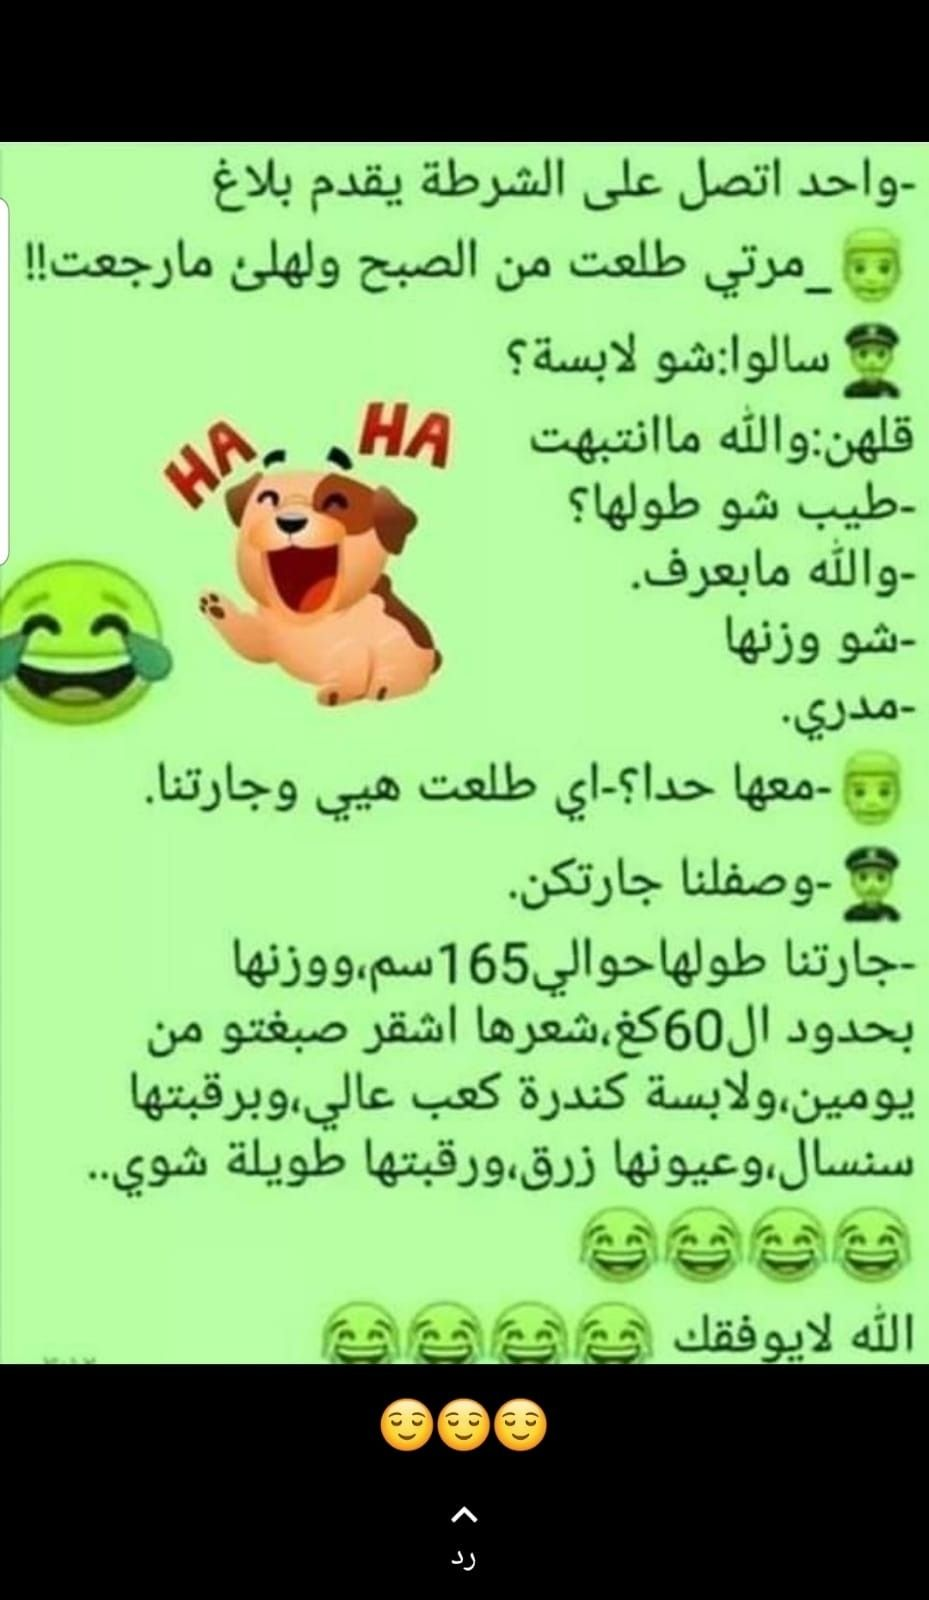 Pin By Fatima On نكت Quotations Arabic Jokes Jokes